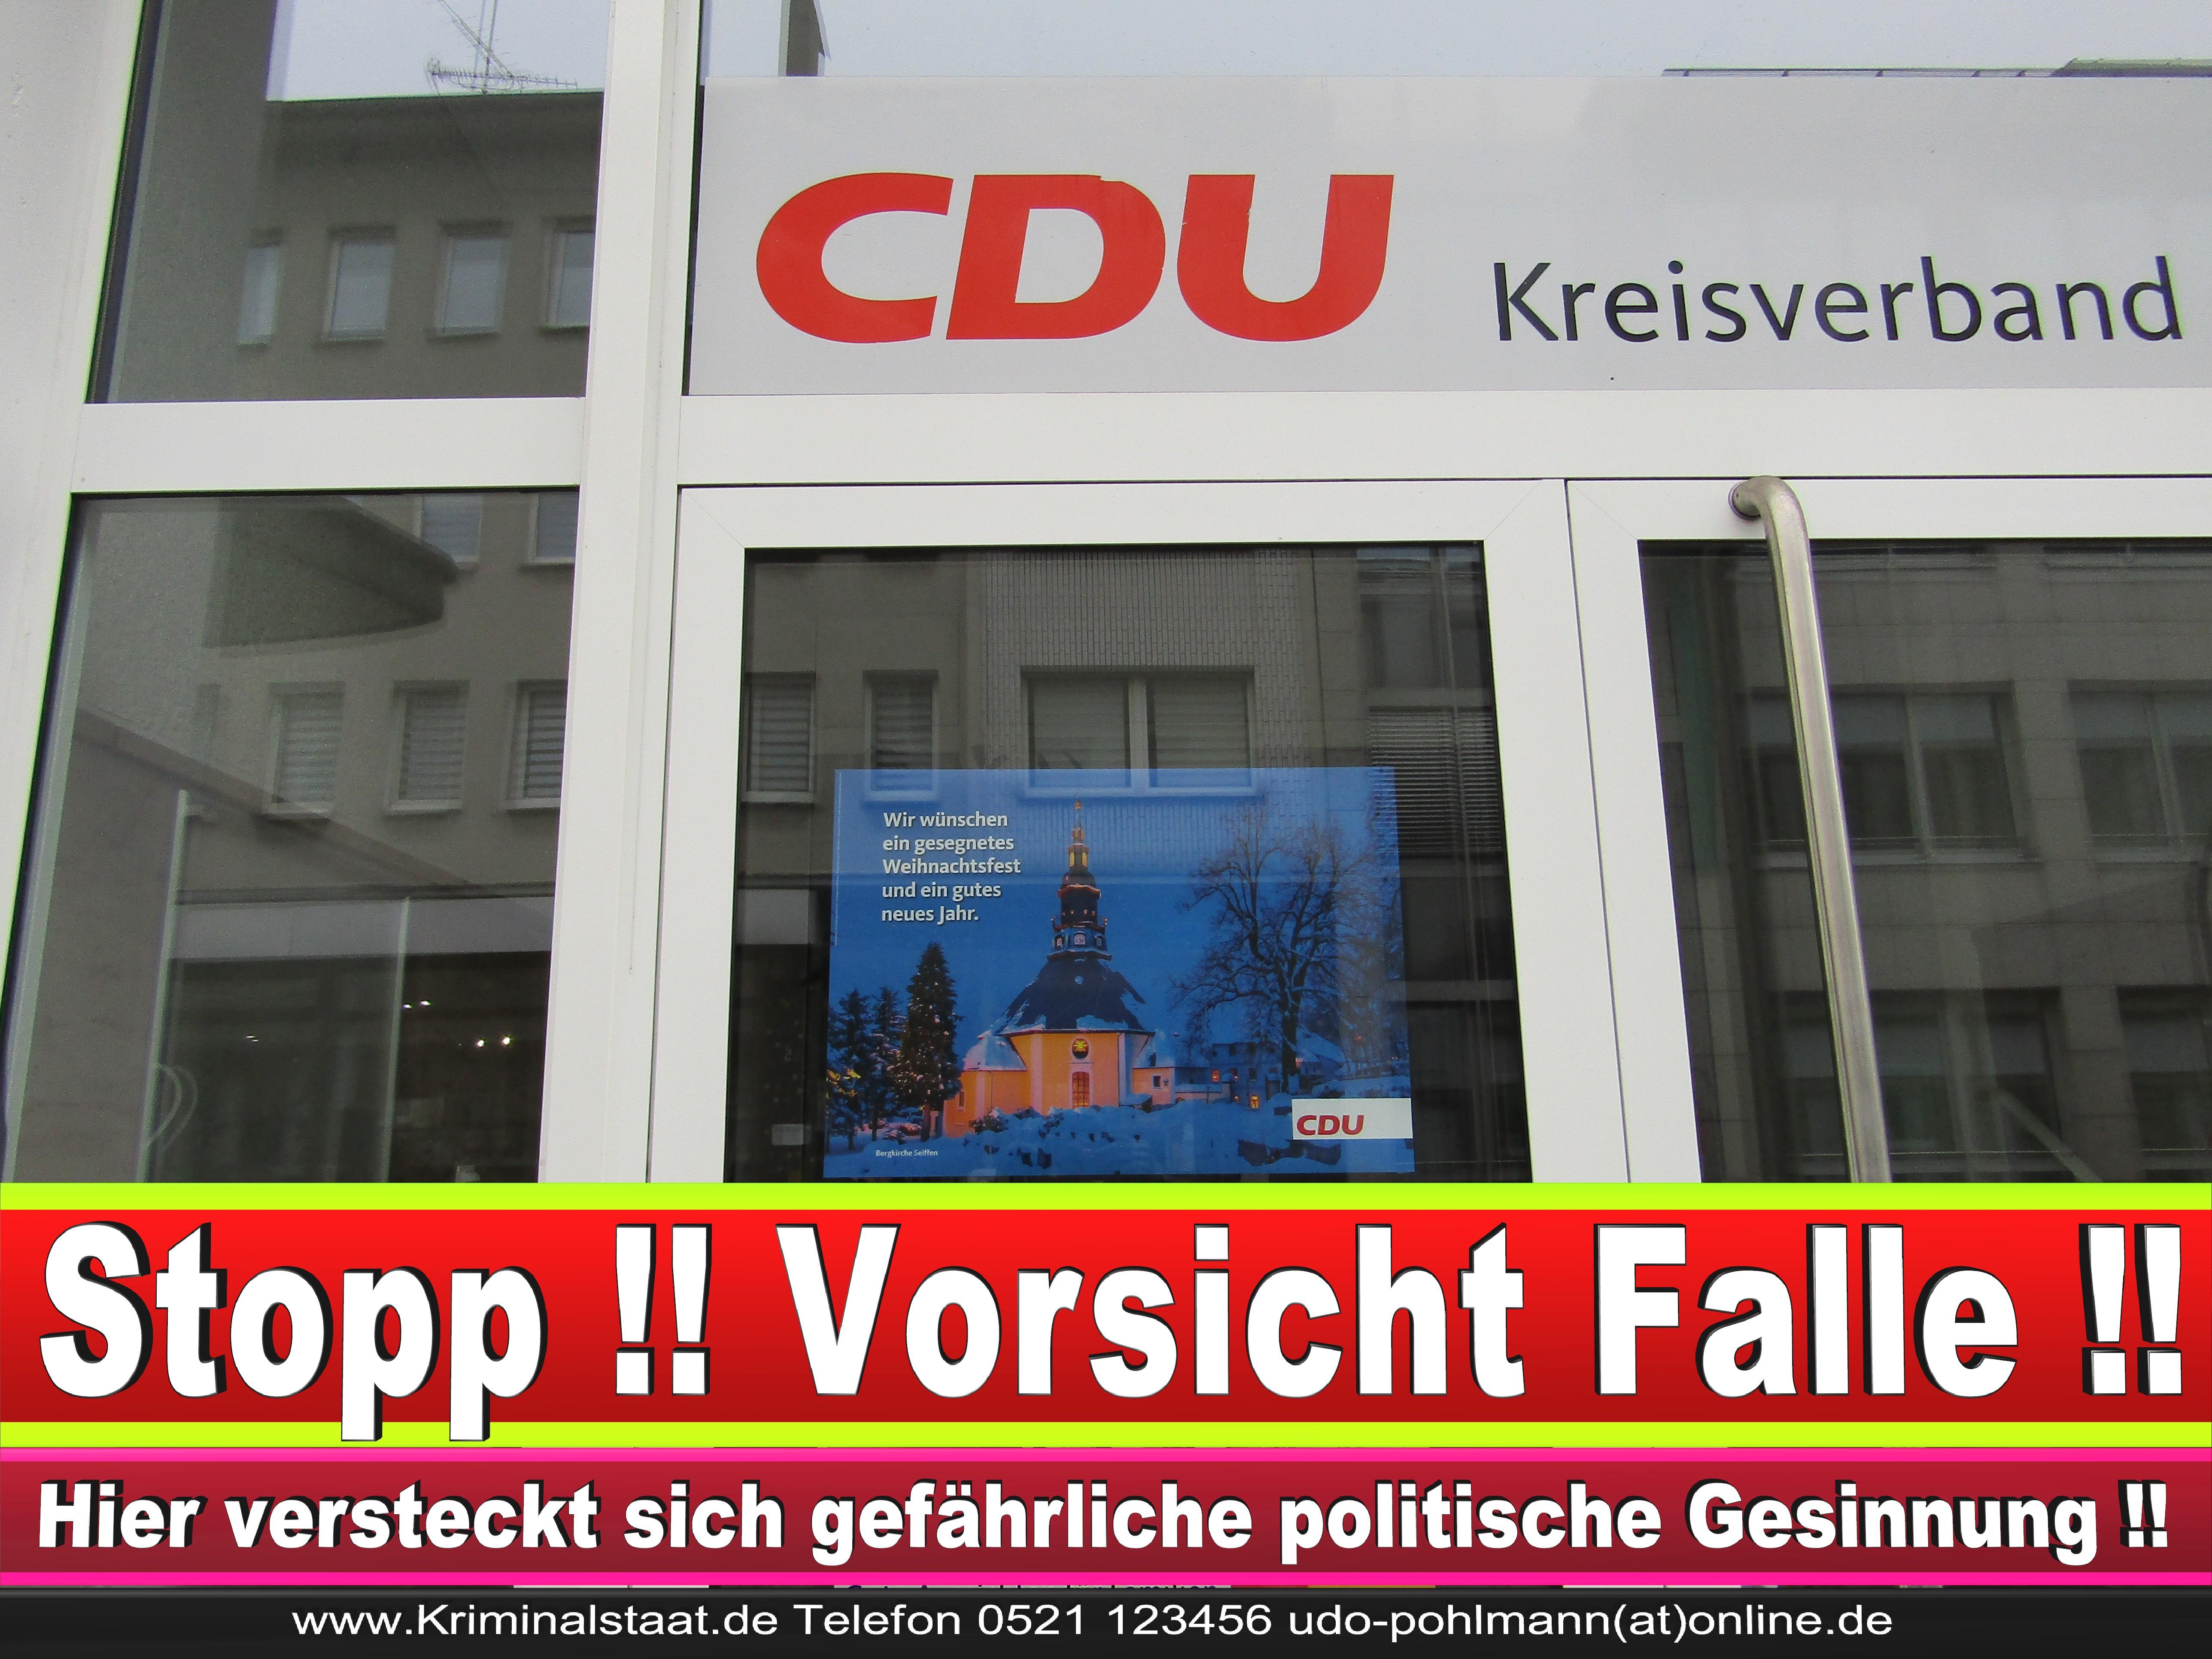 CDU DORTMUND KREISVERBAND BüRGERBüRO CDU FRAKTION ORTSVERBAND CDU NRW GESCHäFTSSTELLE ADRESSE RATSMITGLIEDER CDU (3) 1